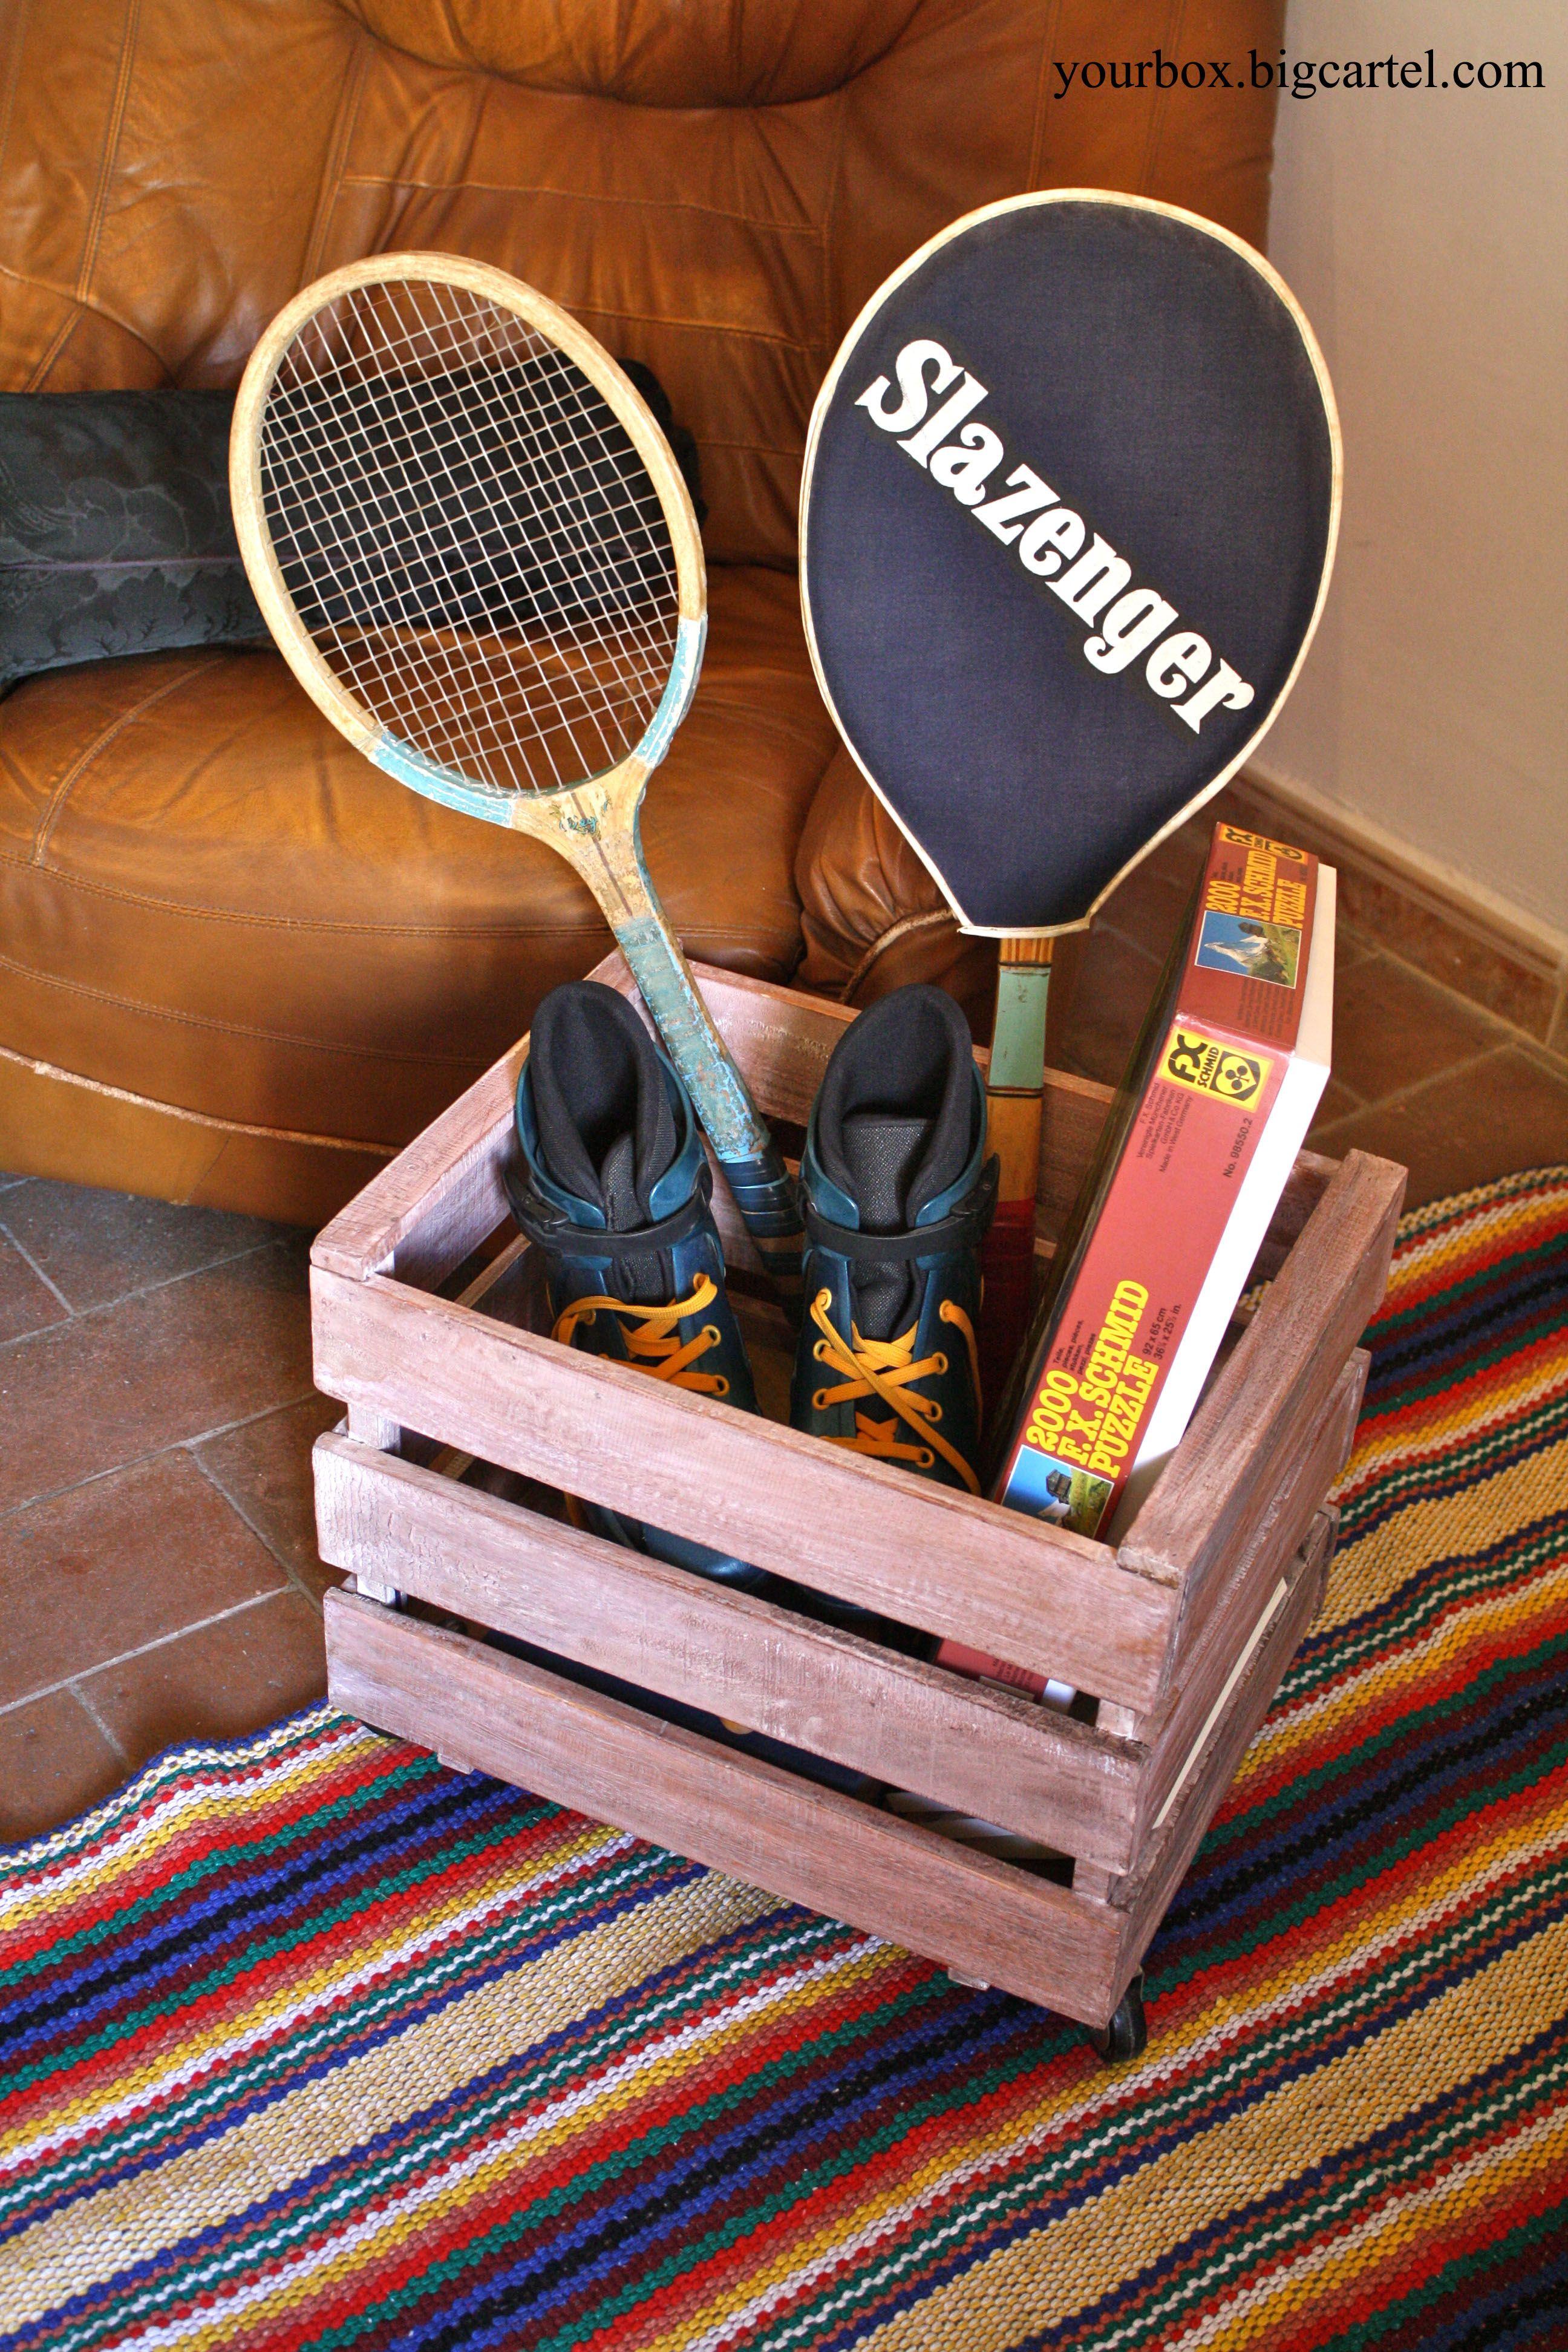 Www Yourbox Bigcartel Com Caja De Madera 3 Listones Estilo Rustico Personalizable Texto A Escoger Ping Pong Paddles Ping Pong